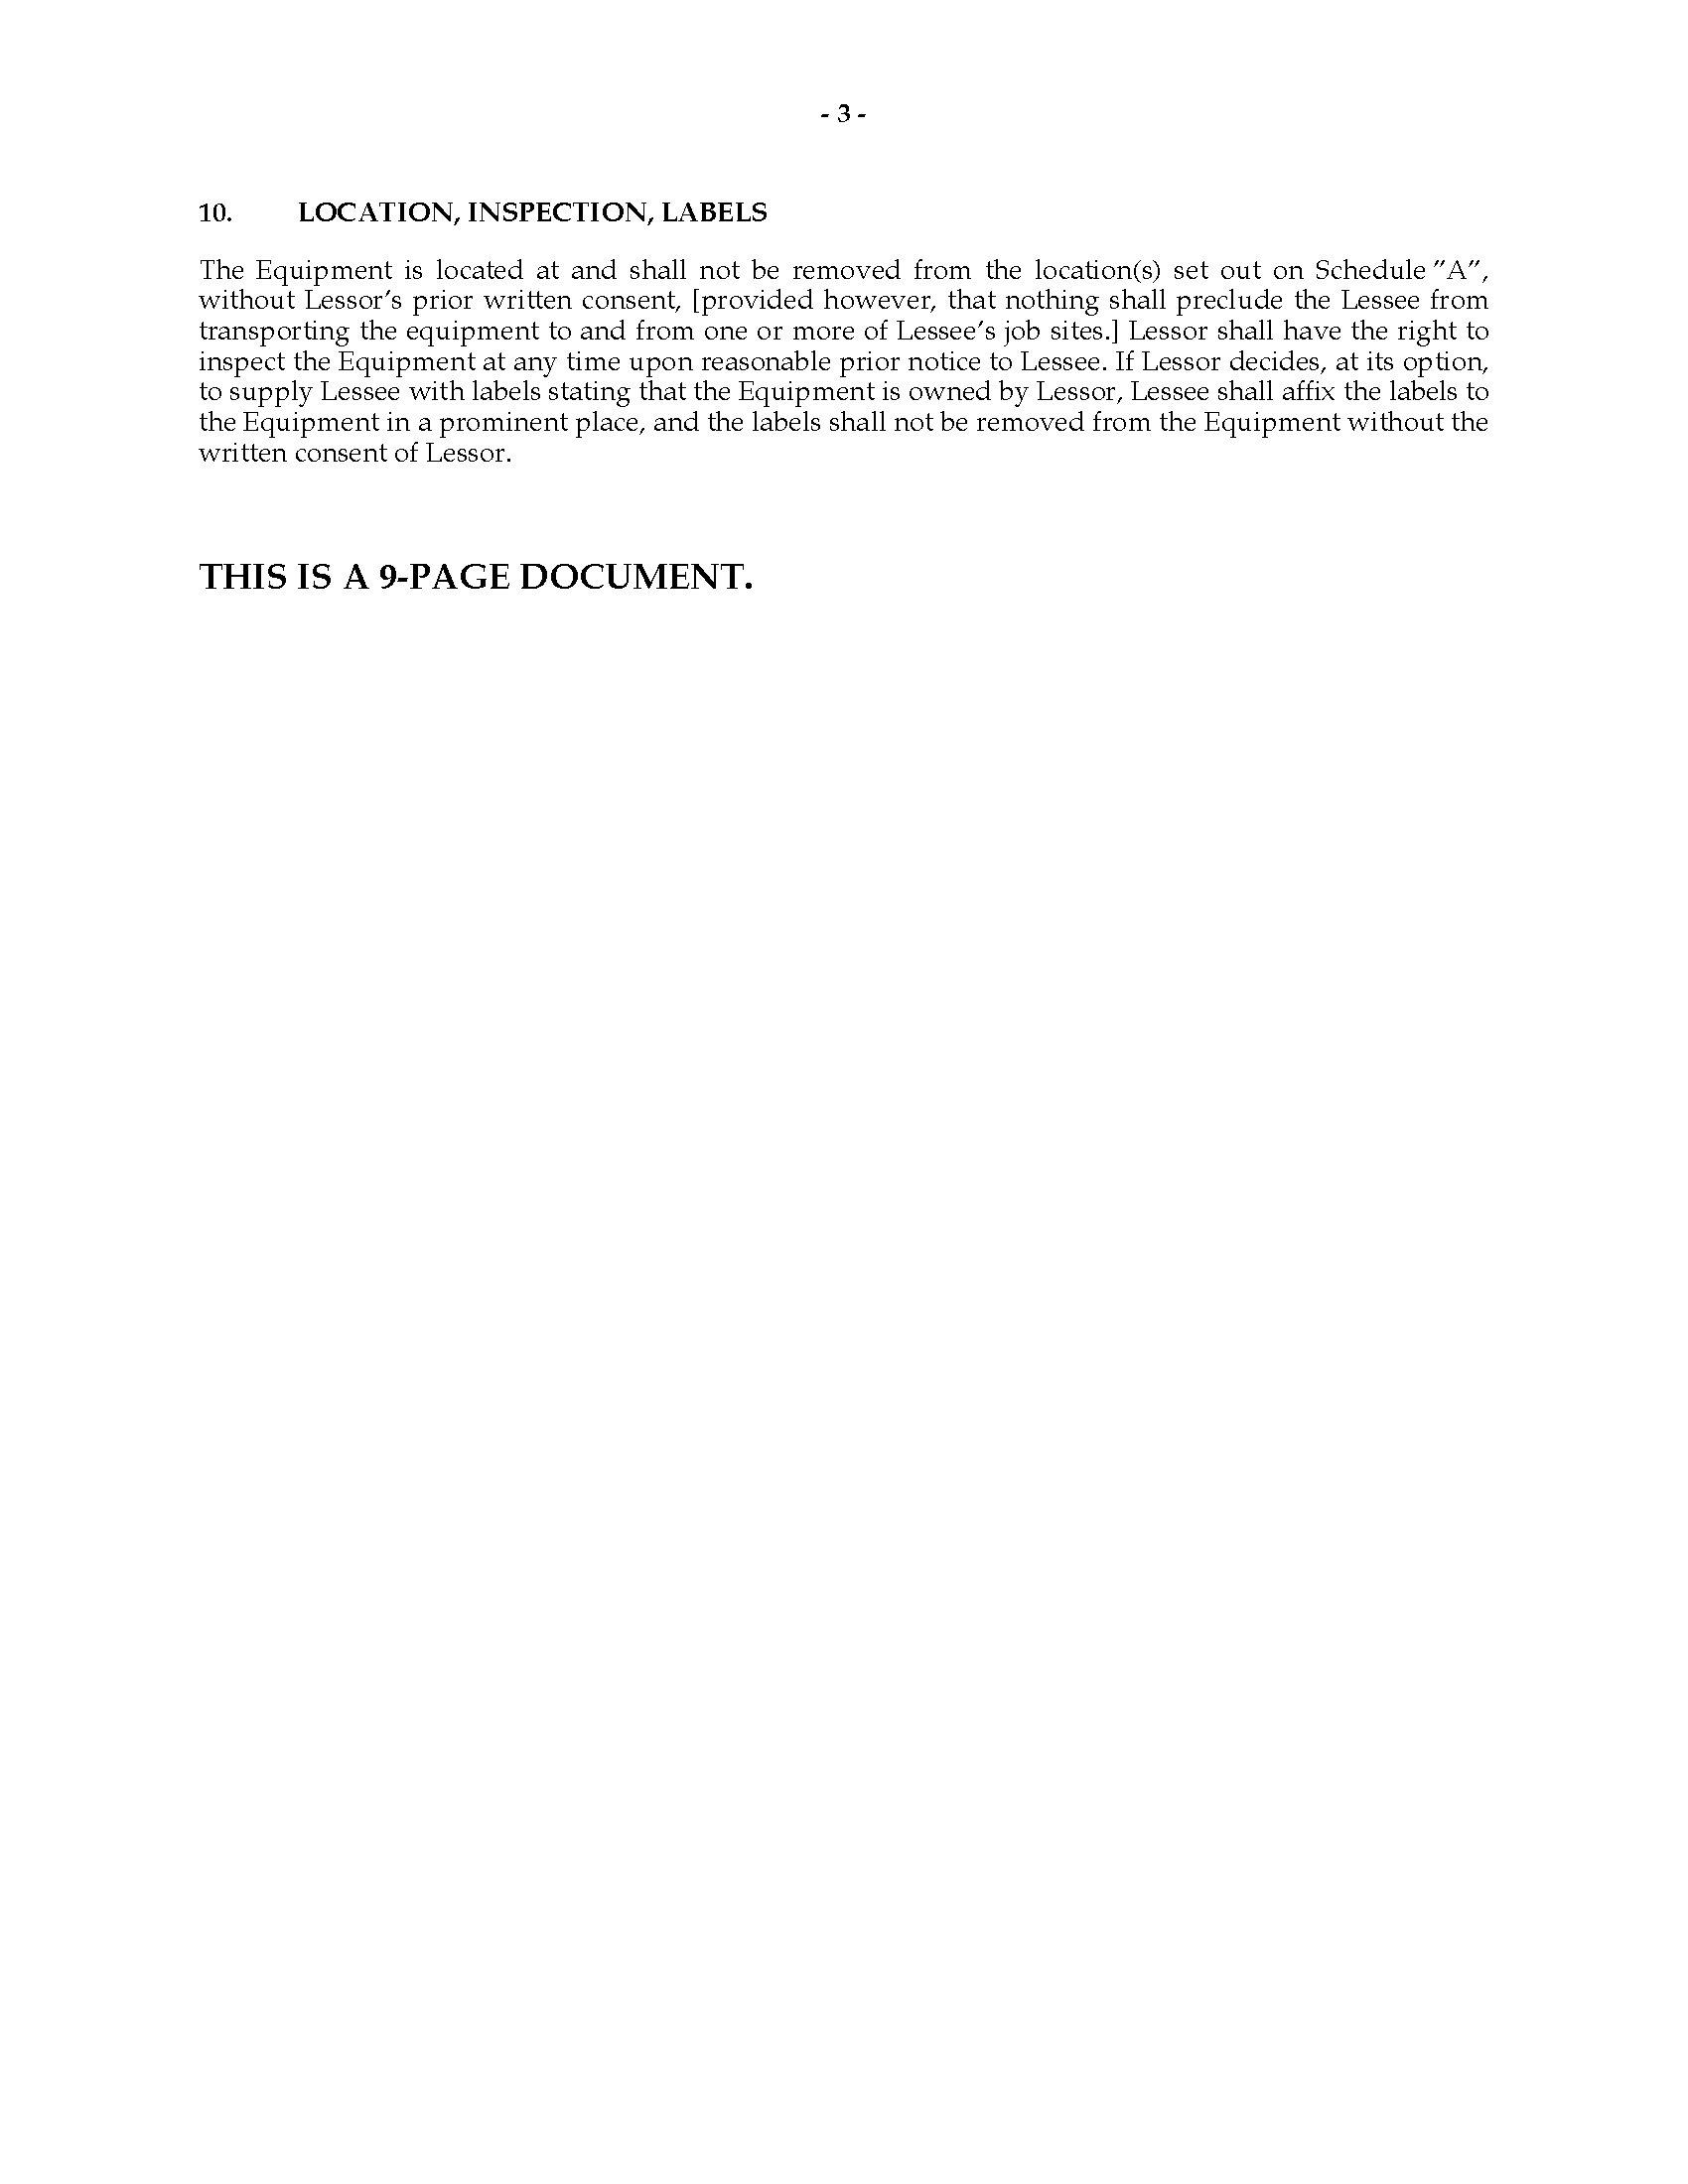 Florida Equipment Lease Agreement – Equipment Rental Agreement Sample